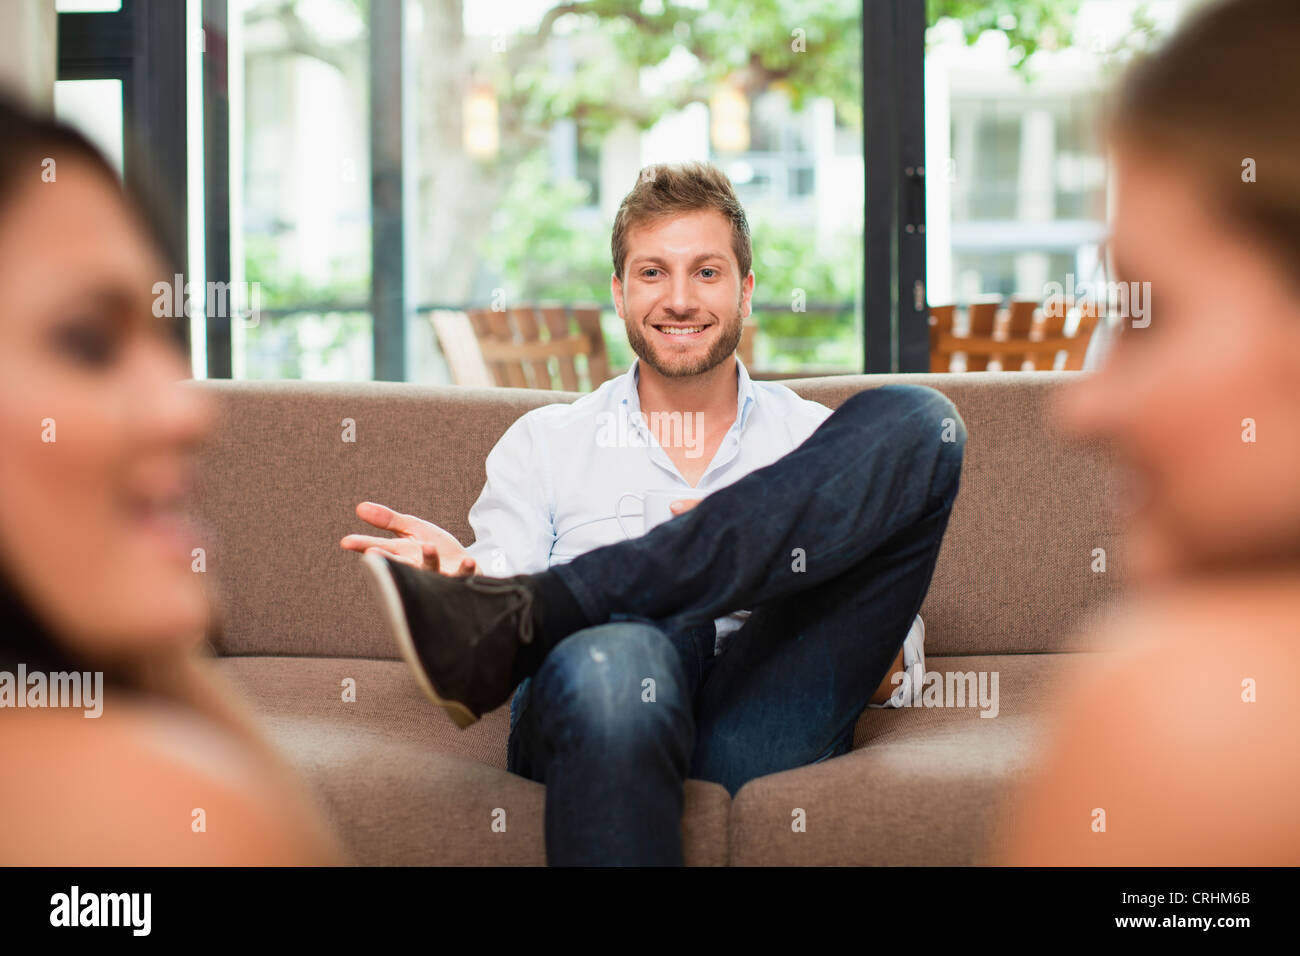 Man talking to women on sofa - Stock Image